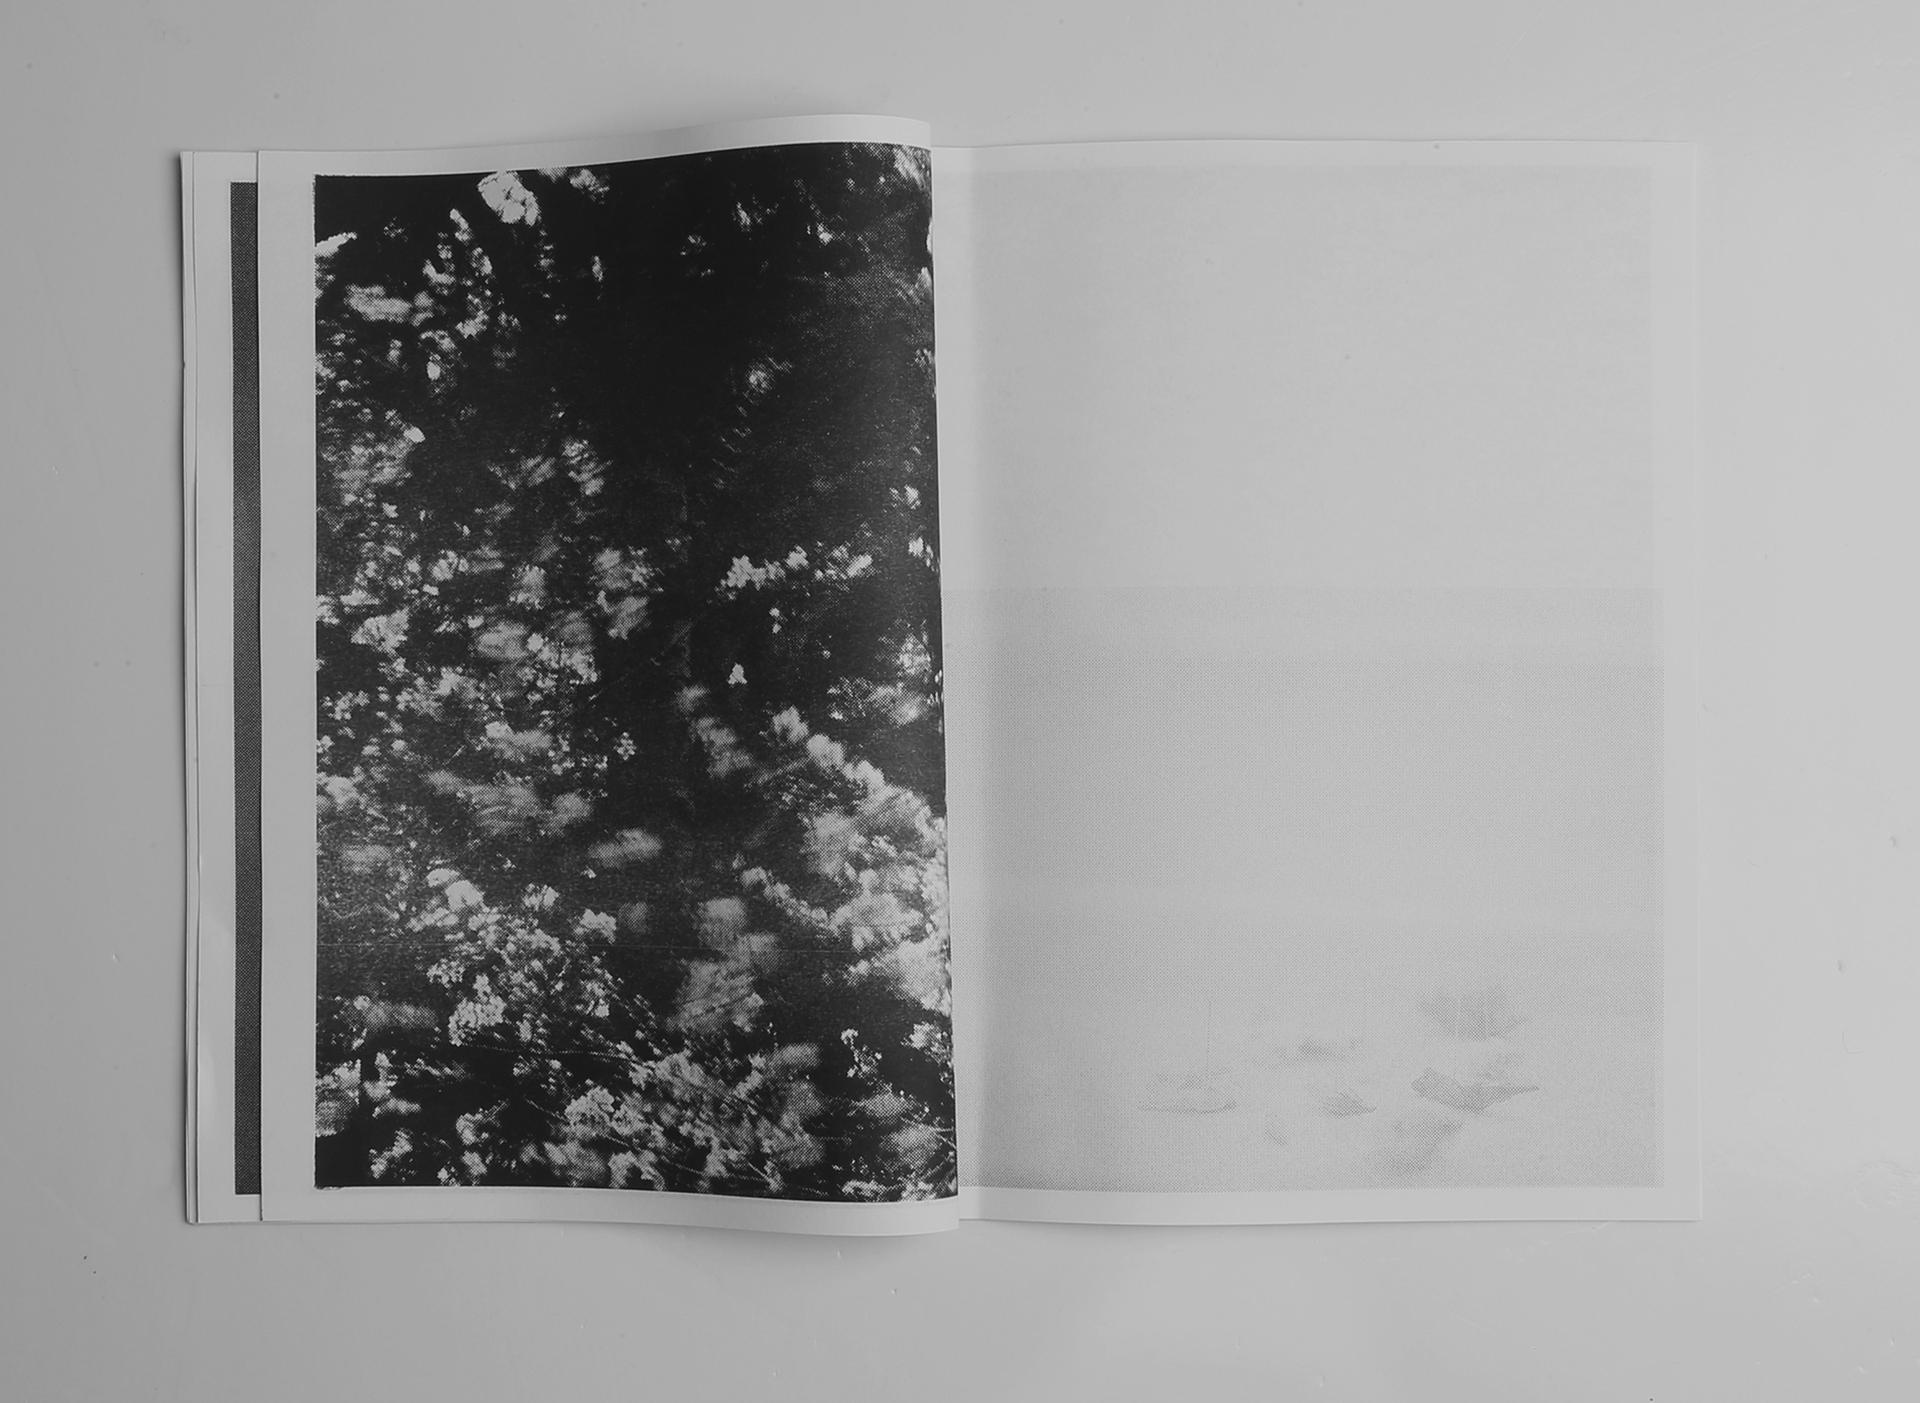 Details inside the book#2